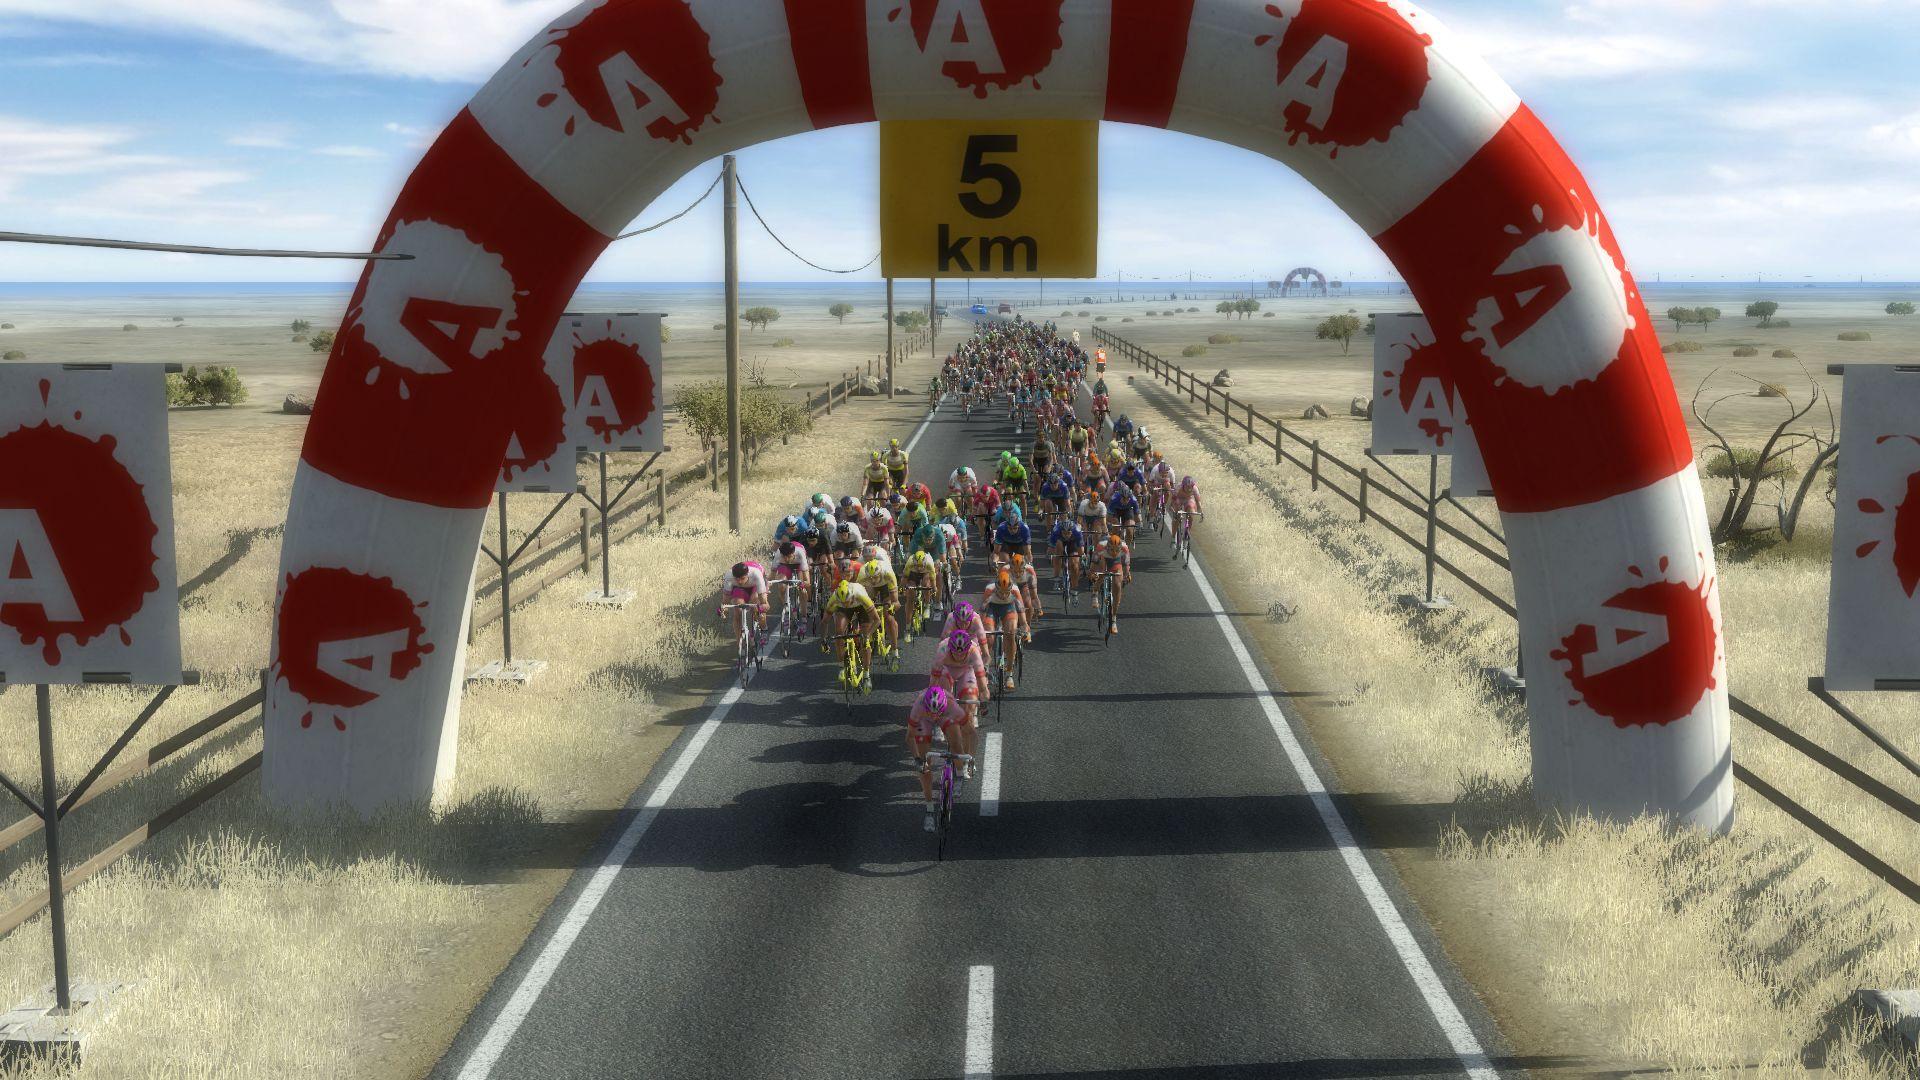 pcmdaily.com/images/mg/2019/Races/PT/Qatar/mg19_qat_s03_10.jpg